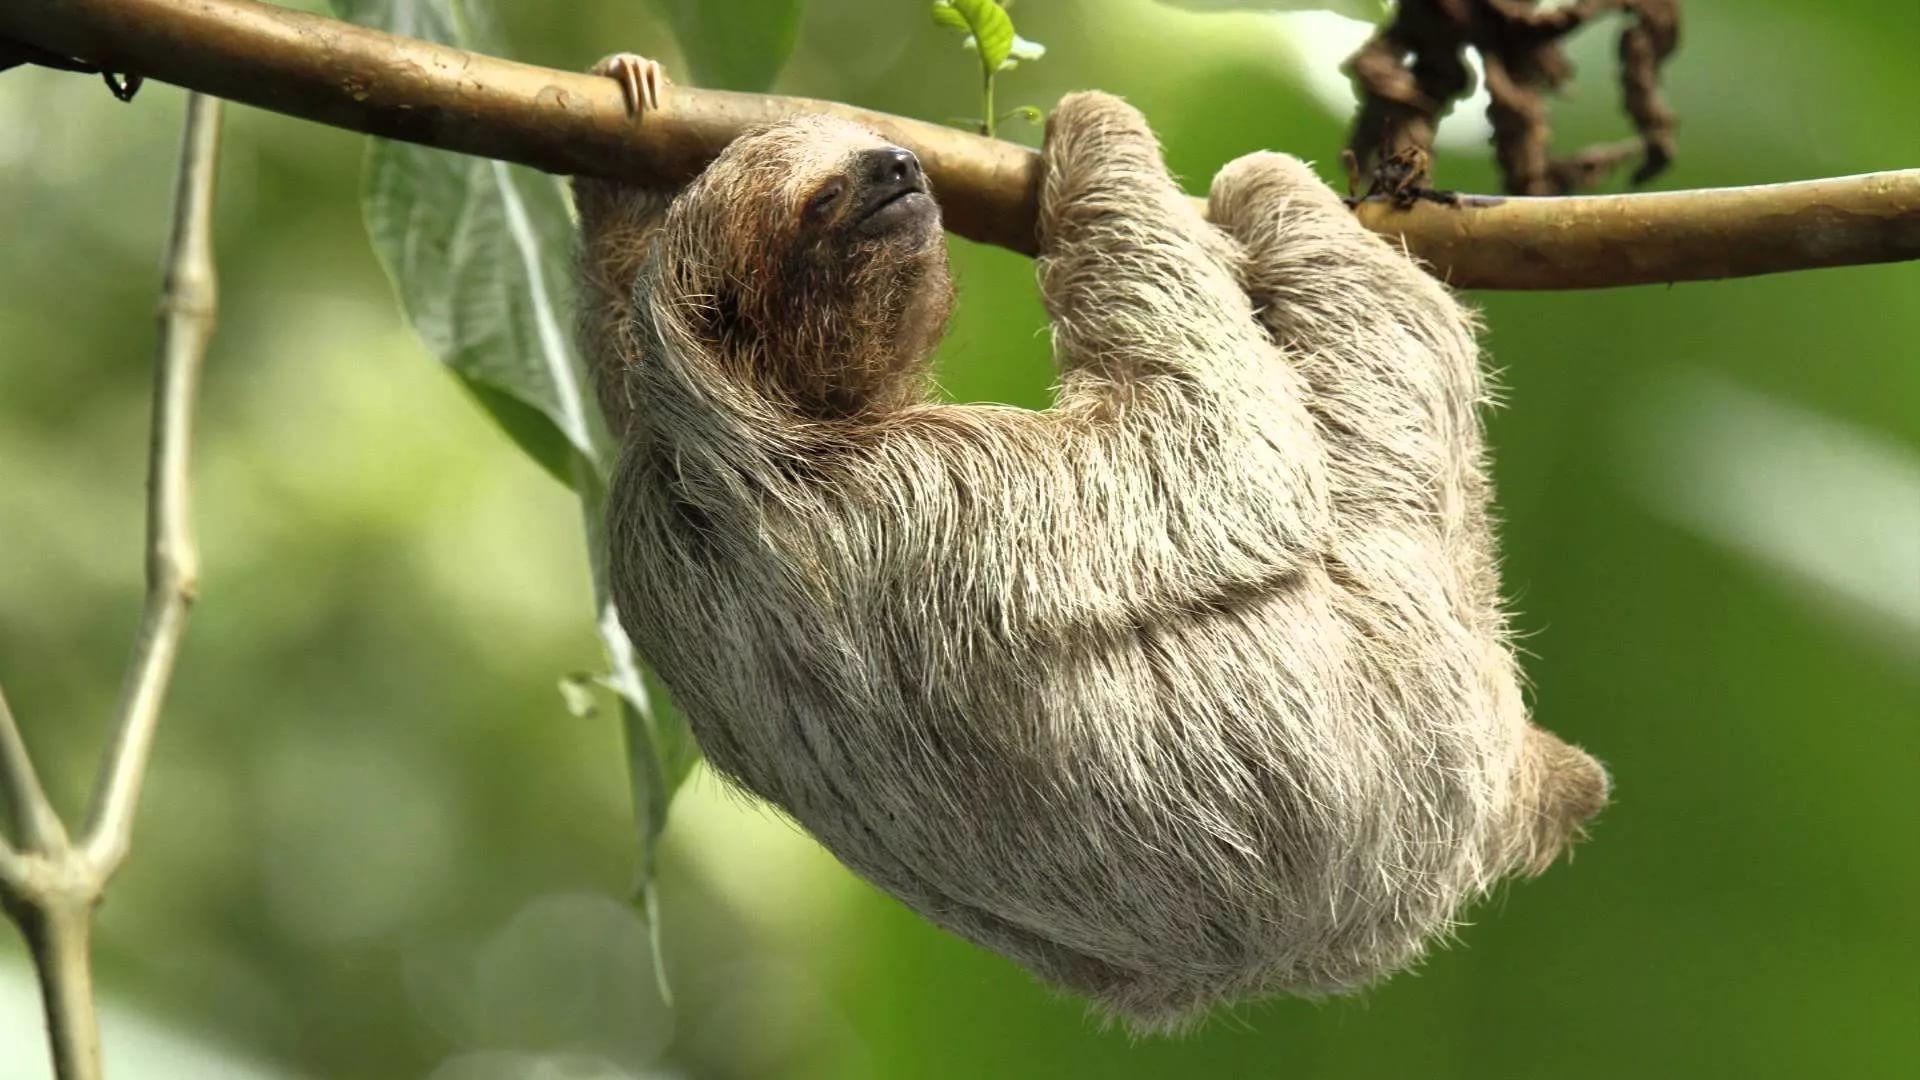 Sloth wallpaper image